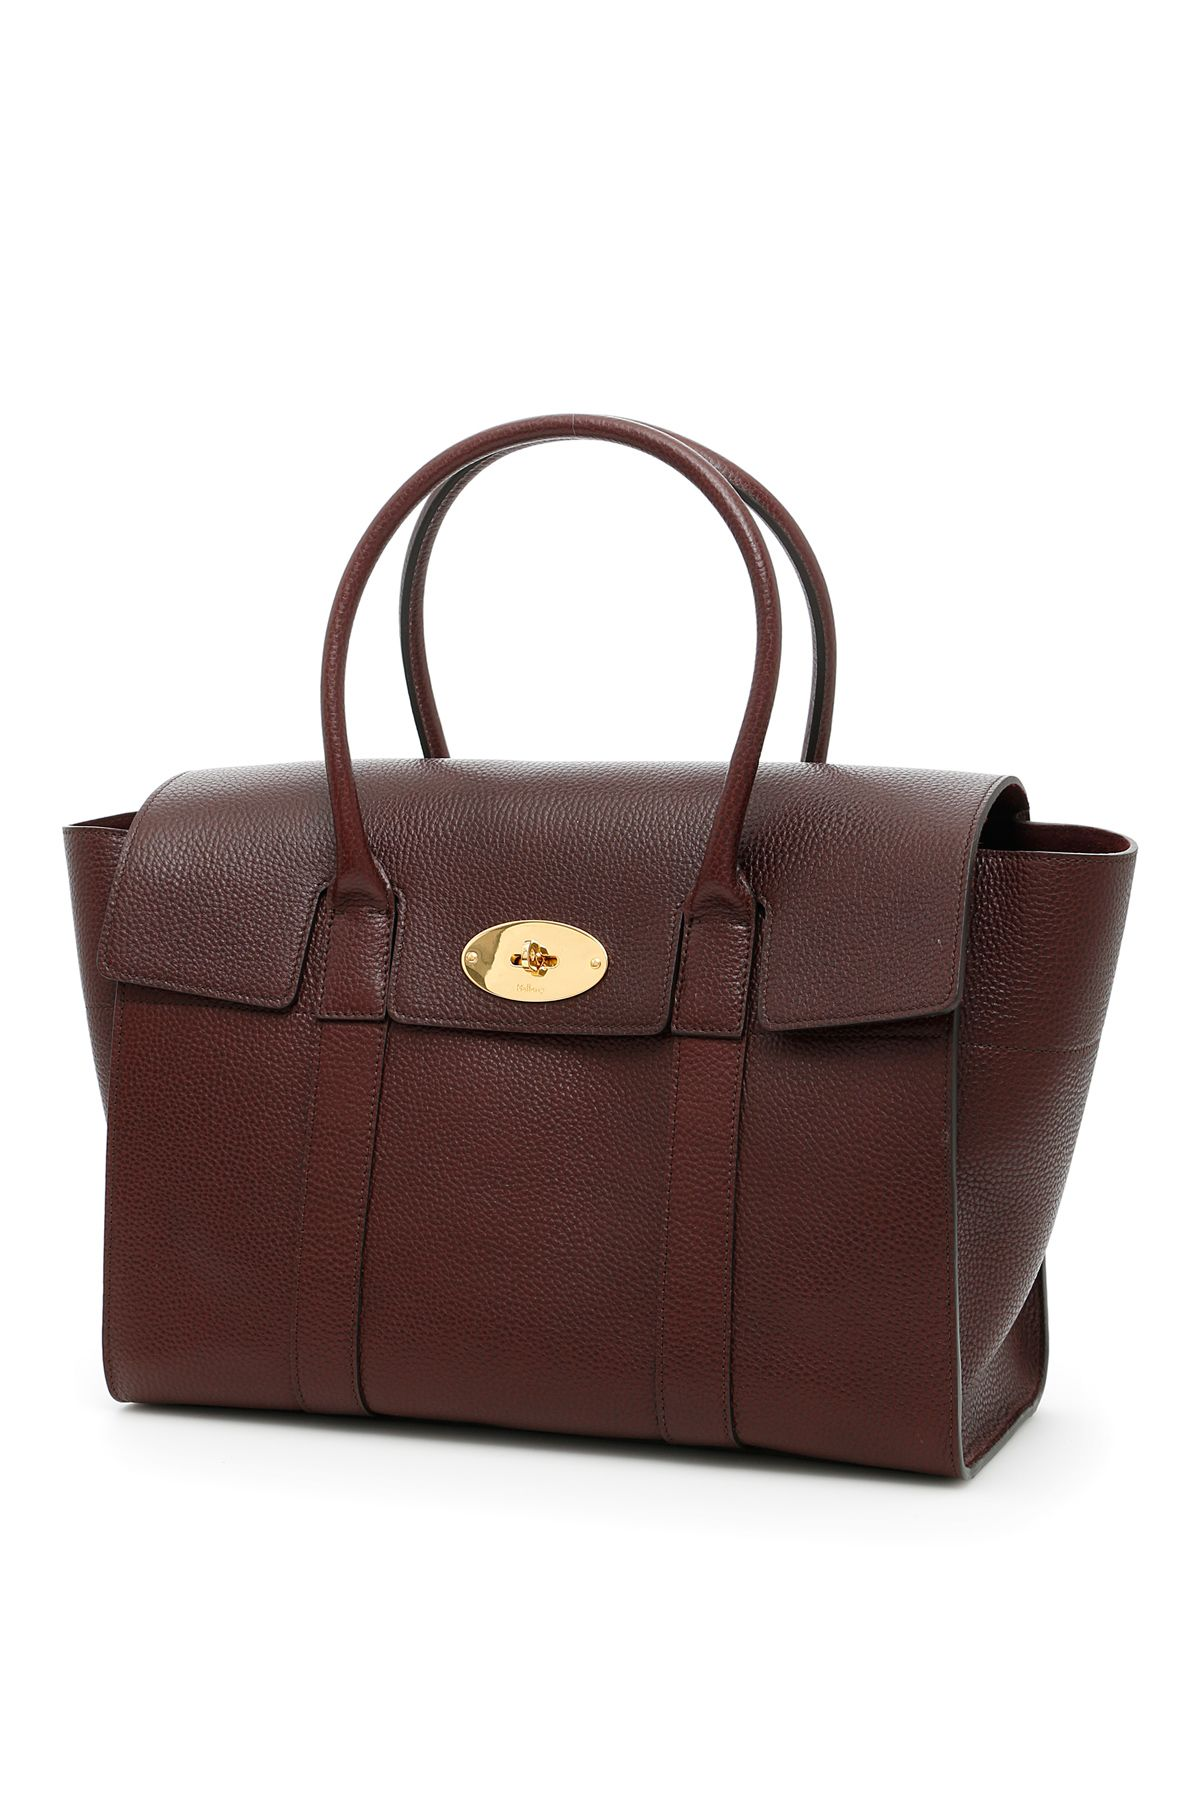 Mulberry Bayswater Bag In Oxbloodmarrone